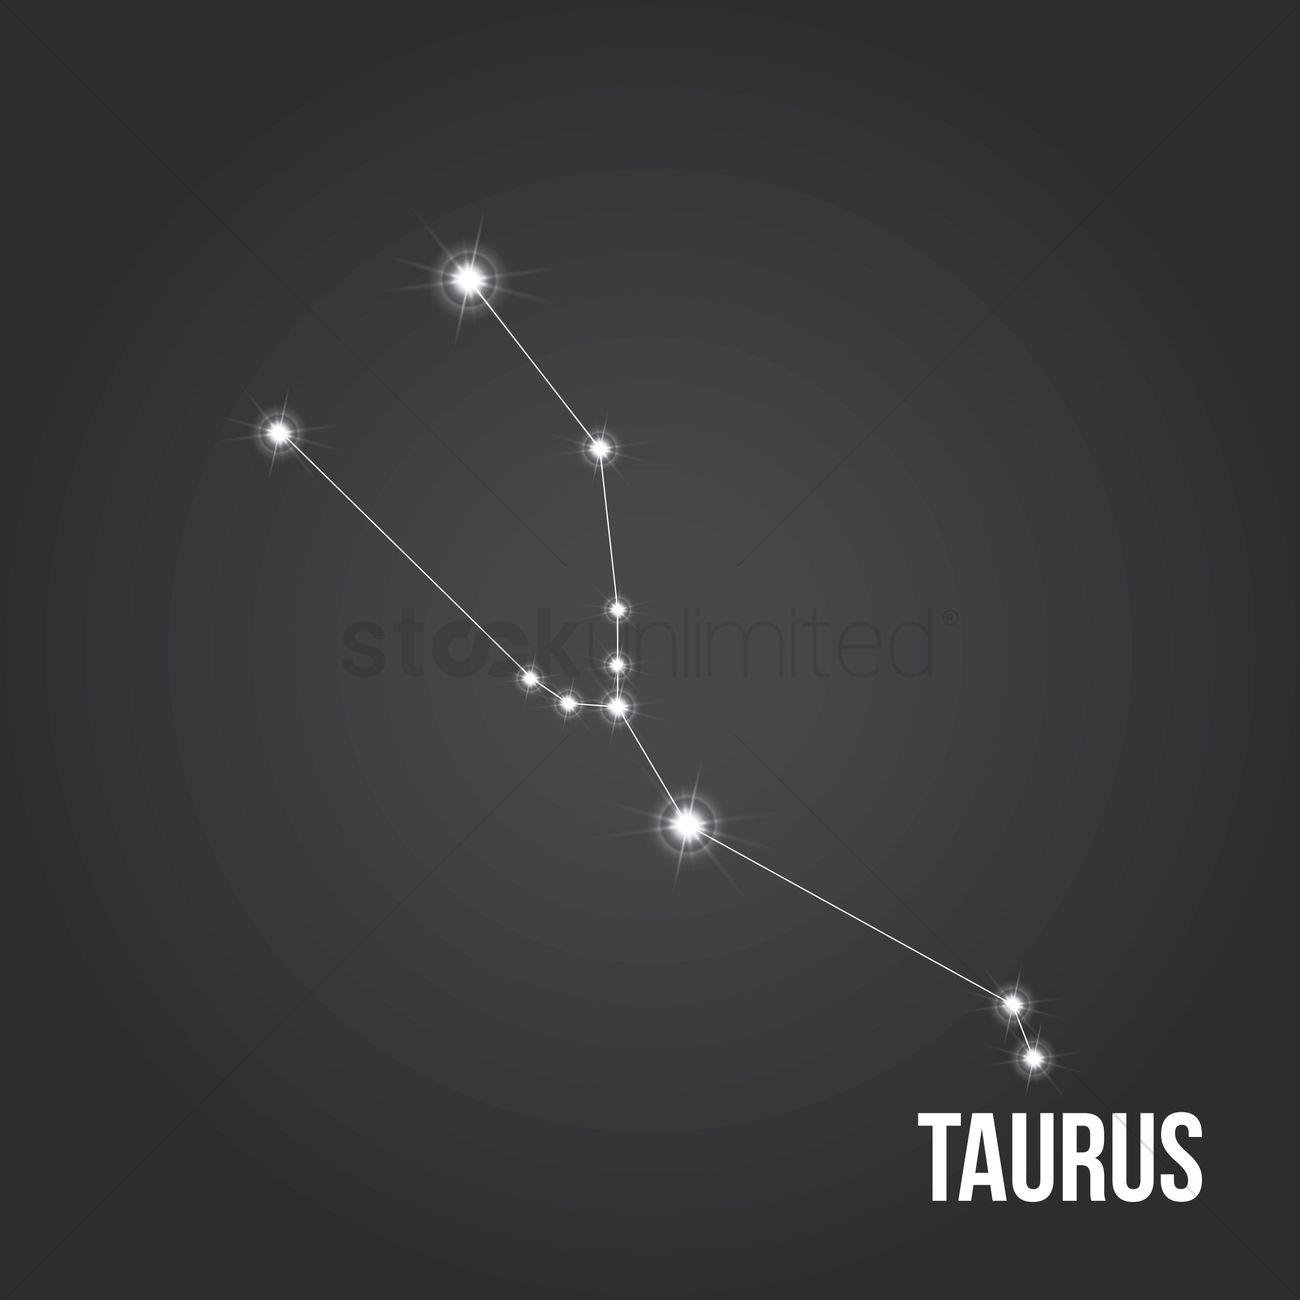 taurus constellation vector image 1616876 stockunlimited star vector graphic stars vector art